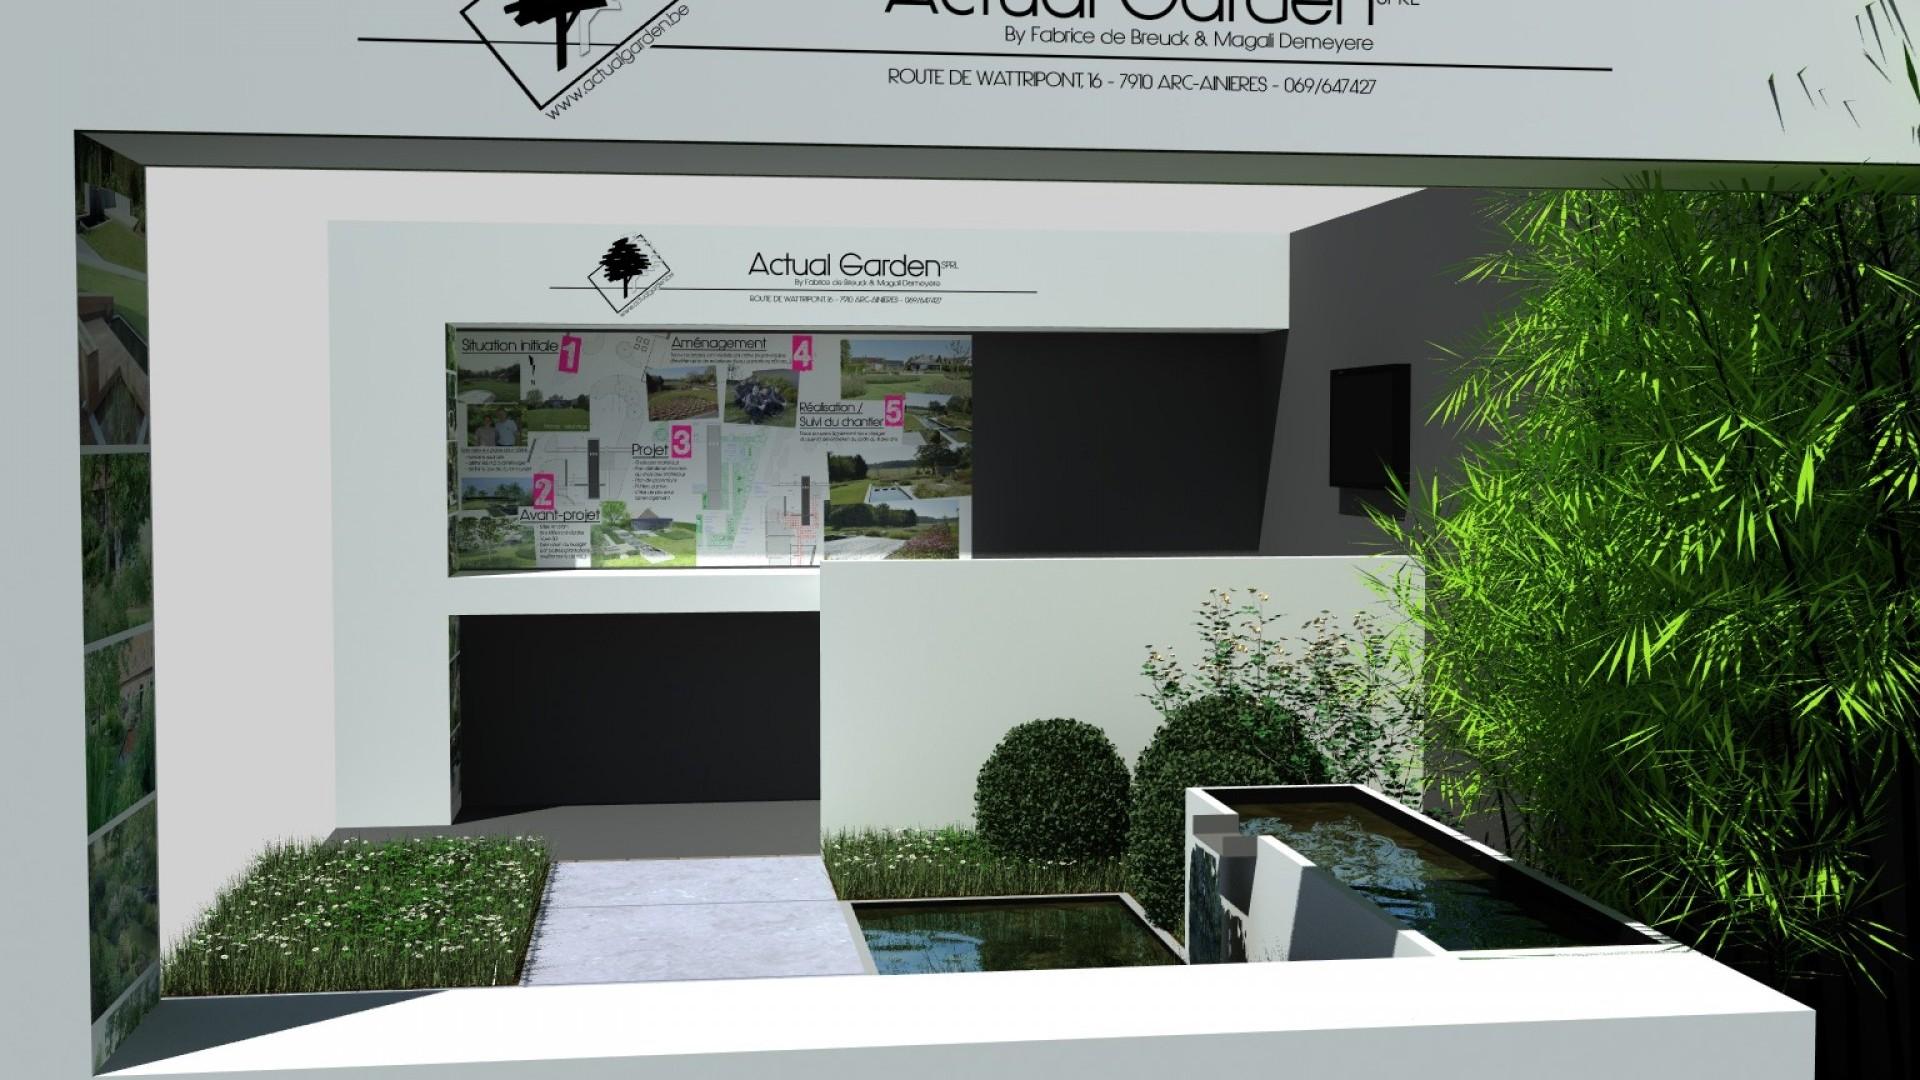 DECO-JARDIN 2018 - Actual Garden